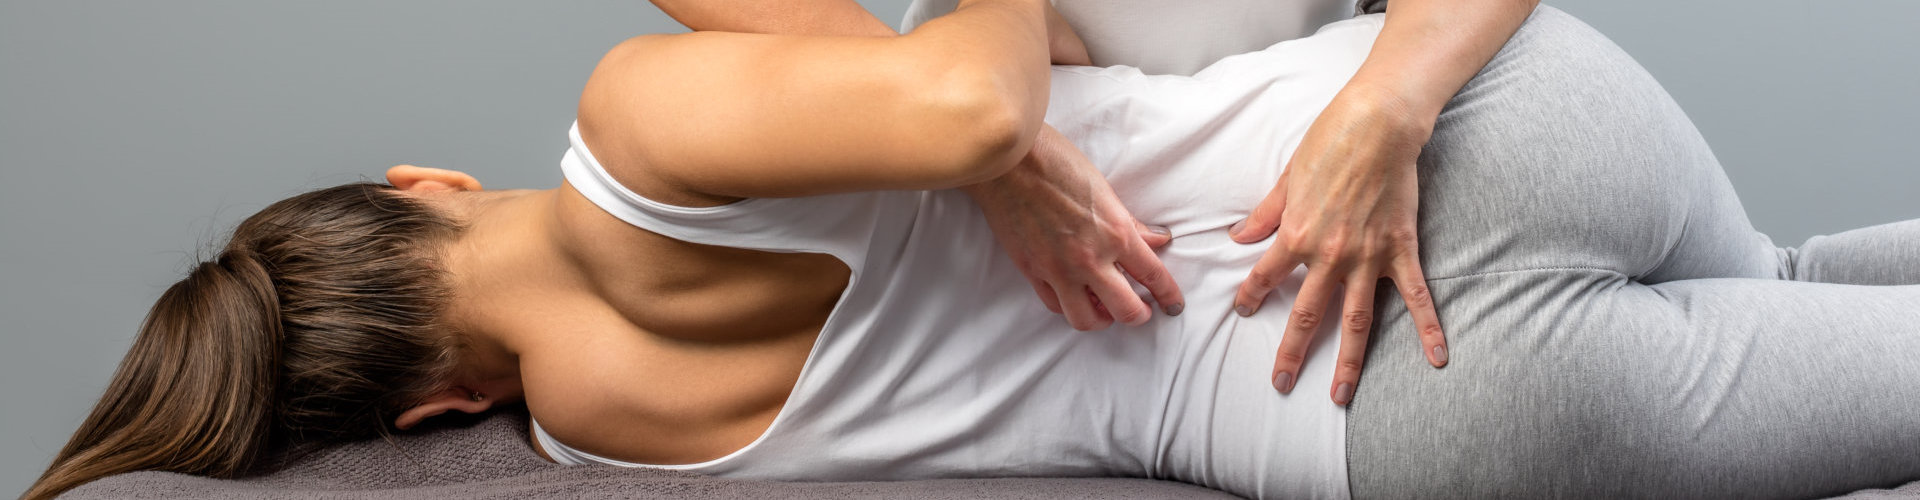 female physiotherapist doing manipulative spine treatment